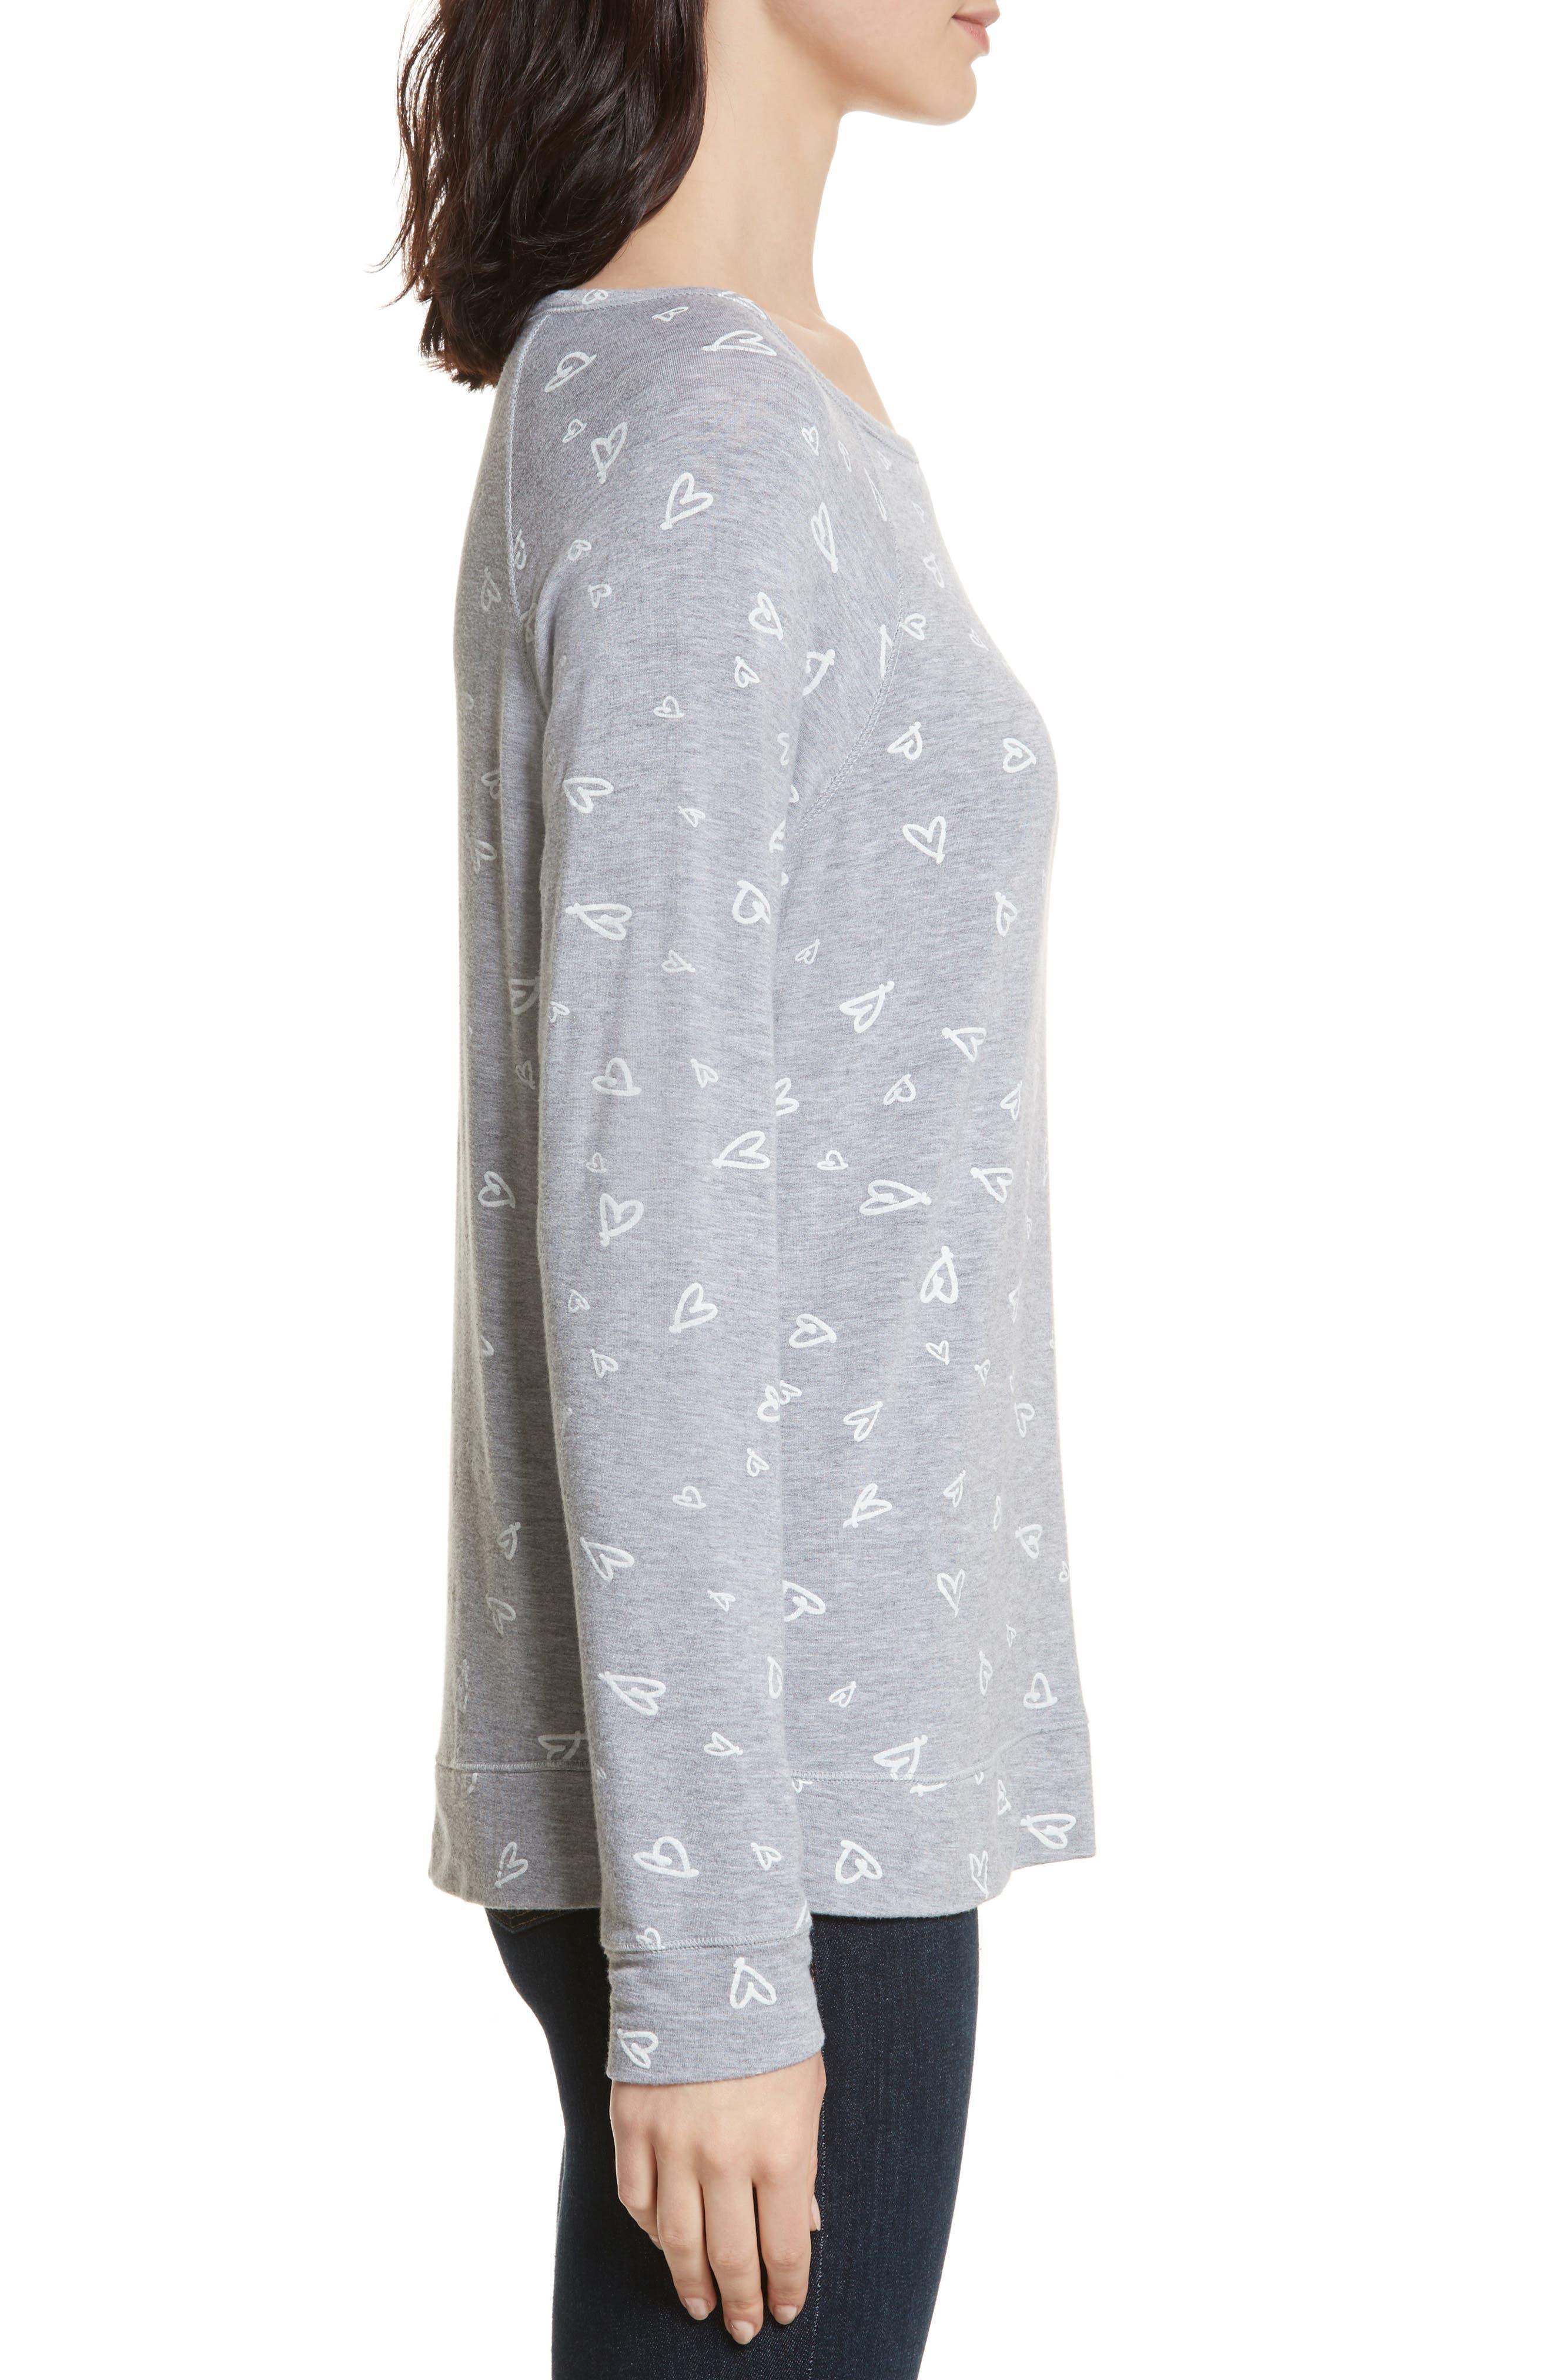 Annora B Print Cotton & Modal Blend Sweatshirt,                             Alternate thumbnail 3, color,                             071